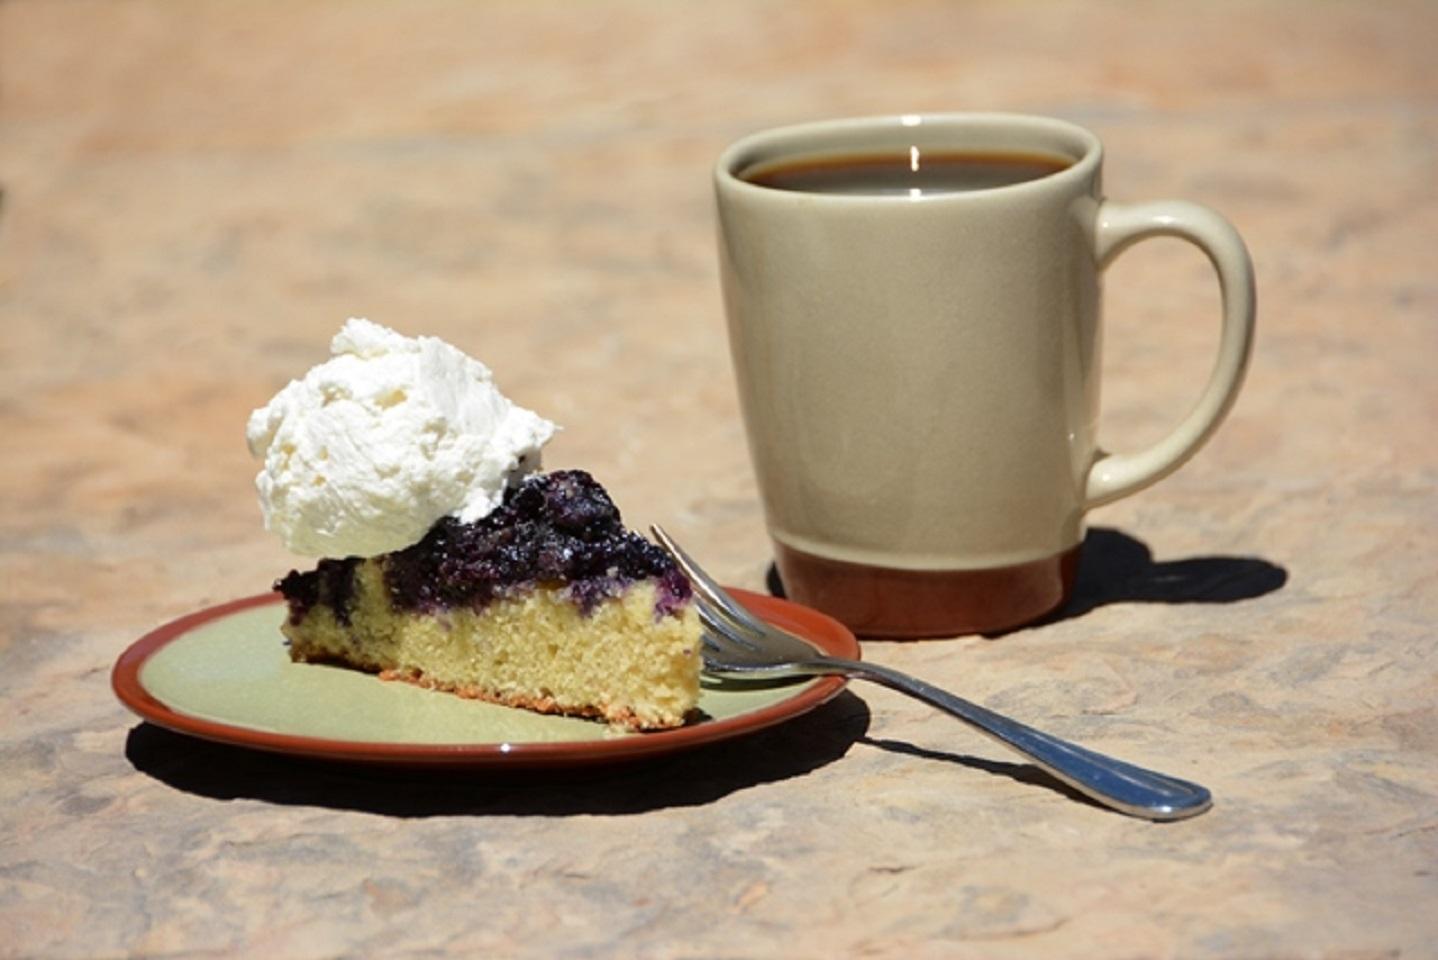 Blueberry Cornmeal Upside-Down Cake